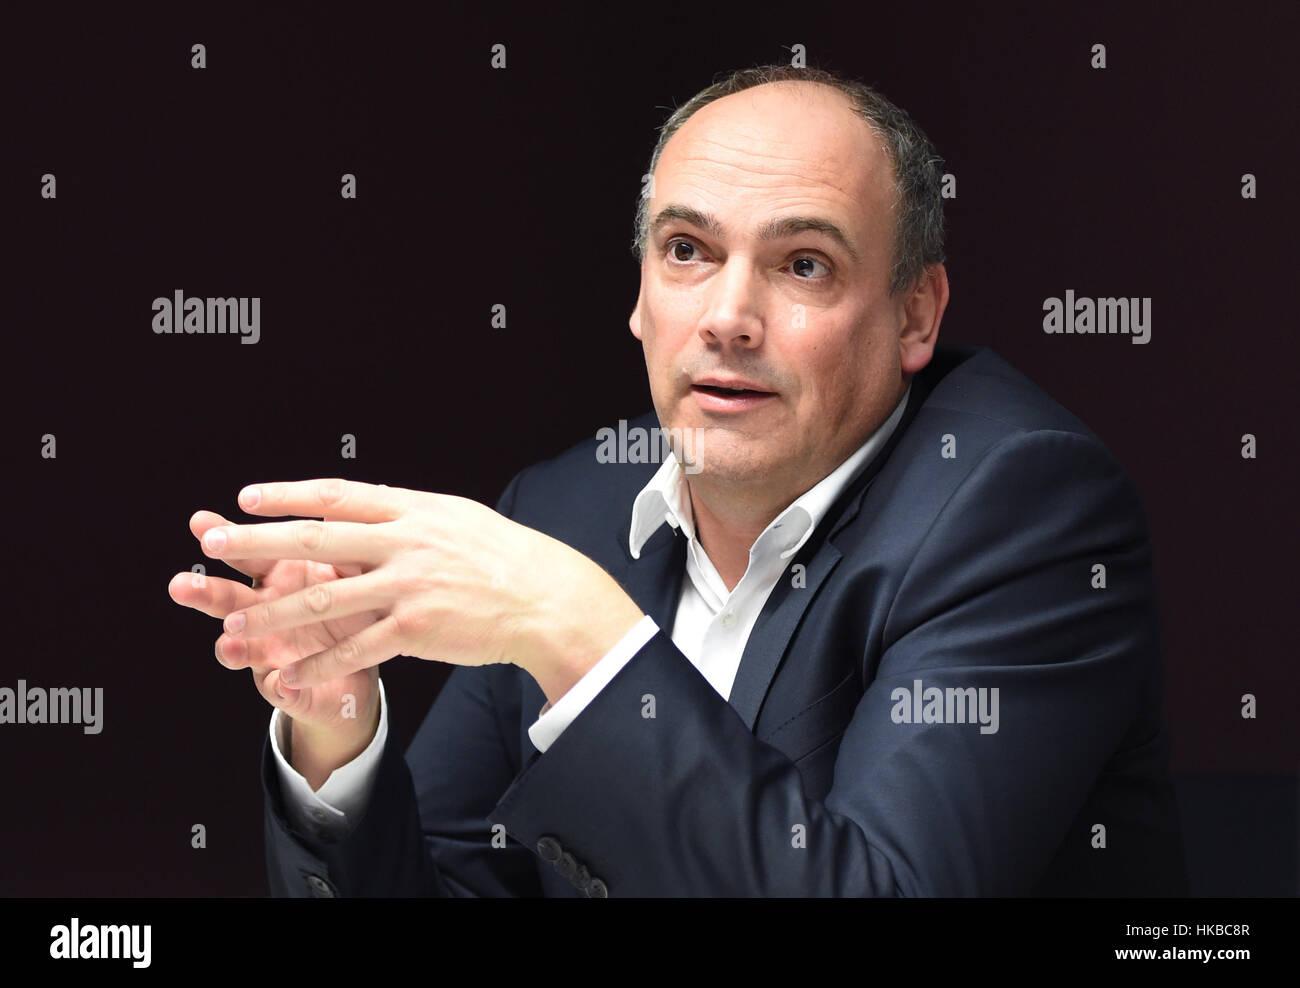 Rolf Hamburg hamburg germany 23rd jan 2017 rolf habben jansen chairman of